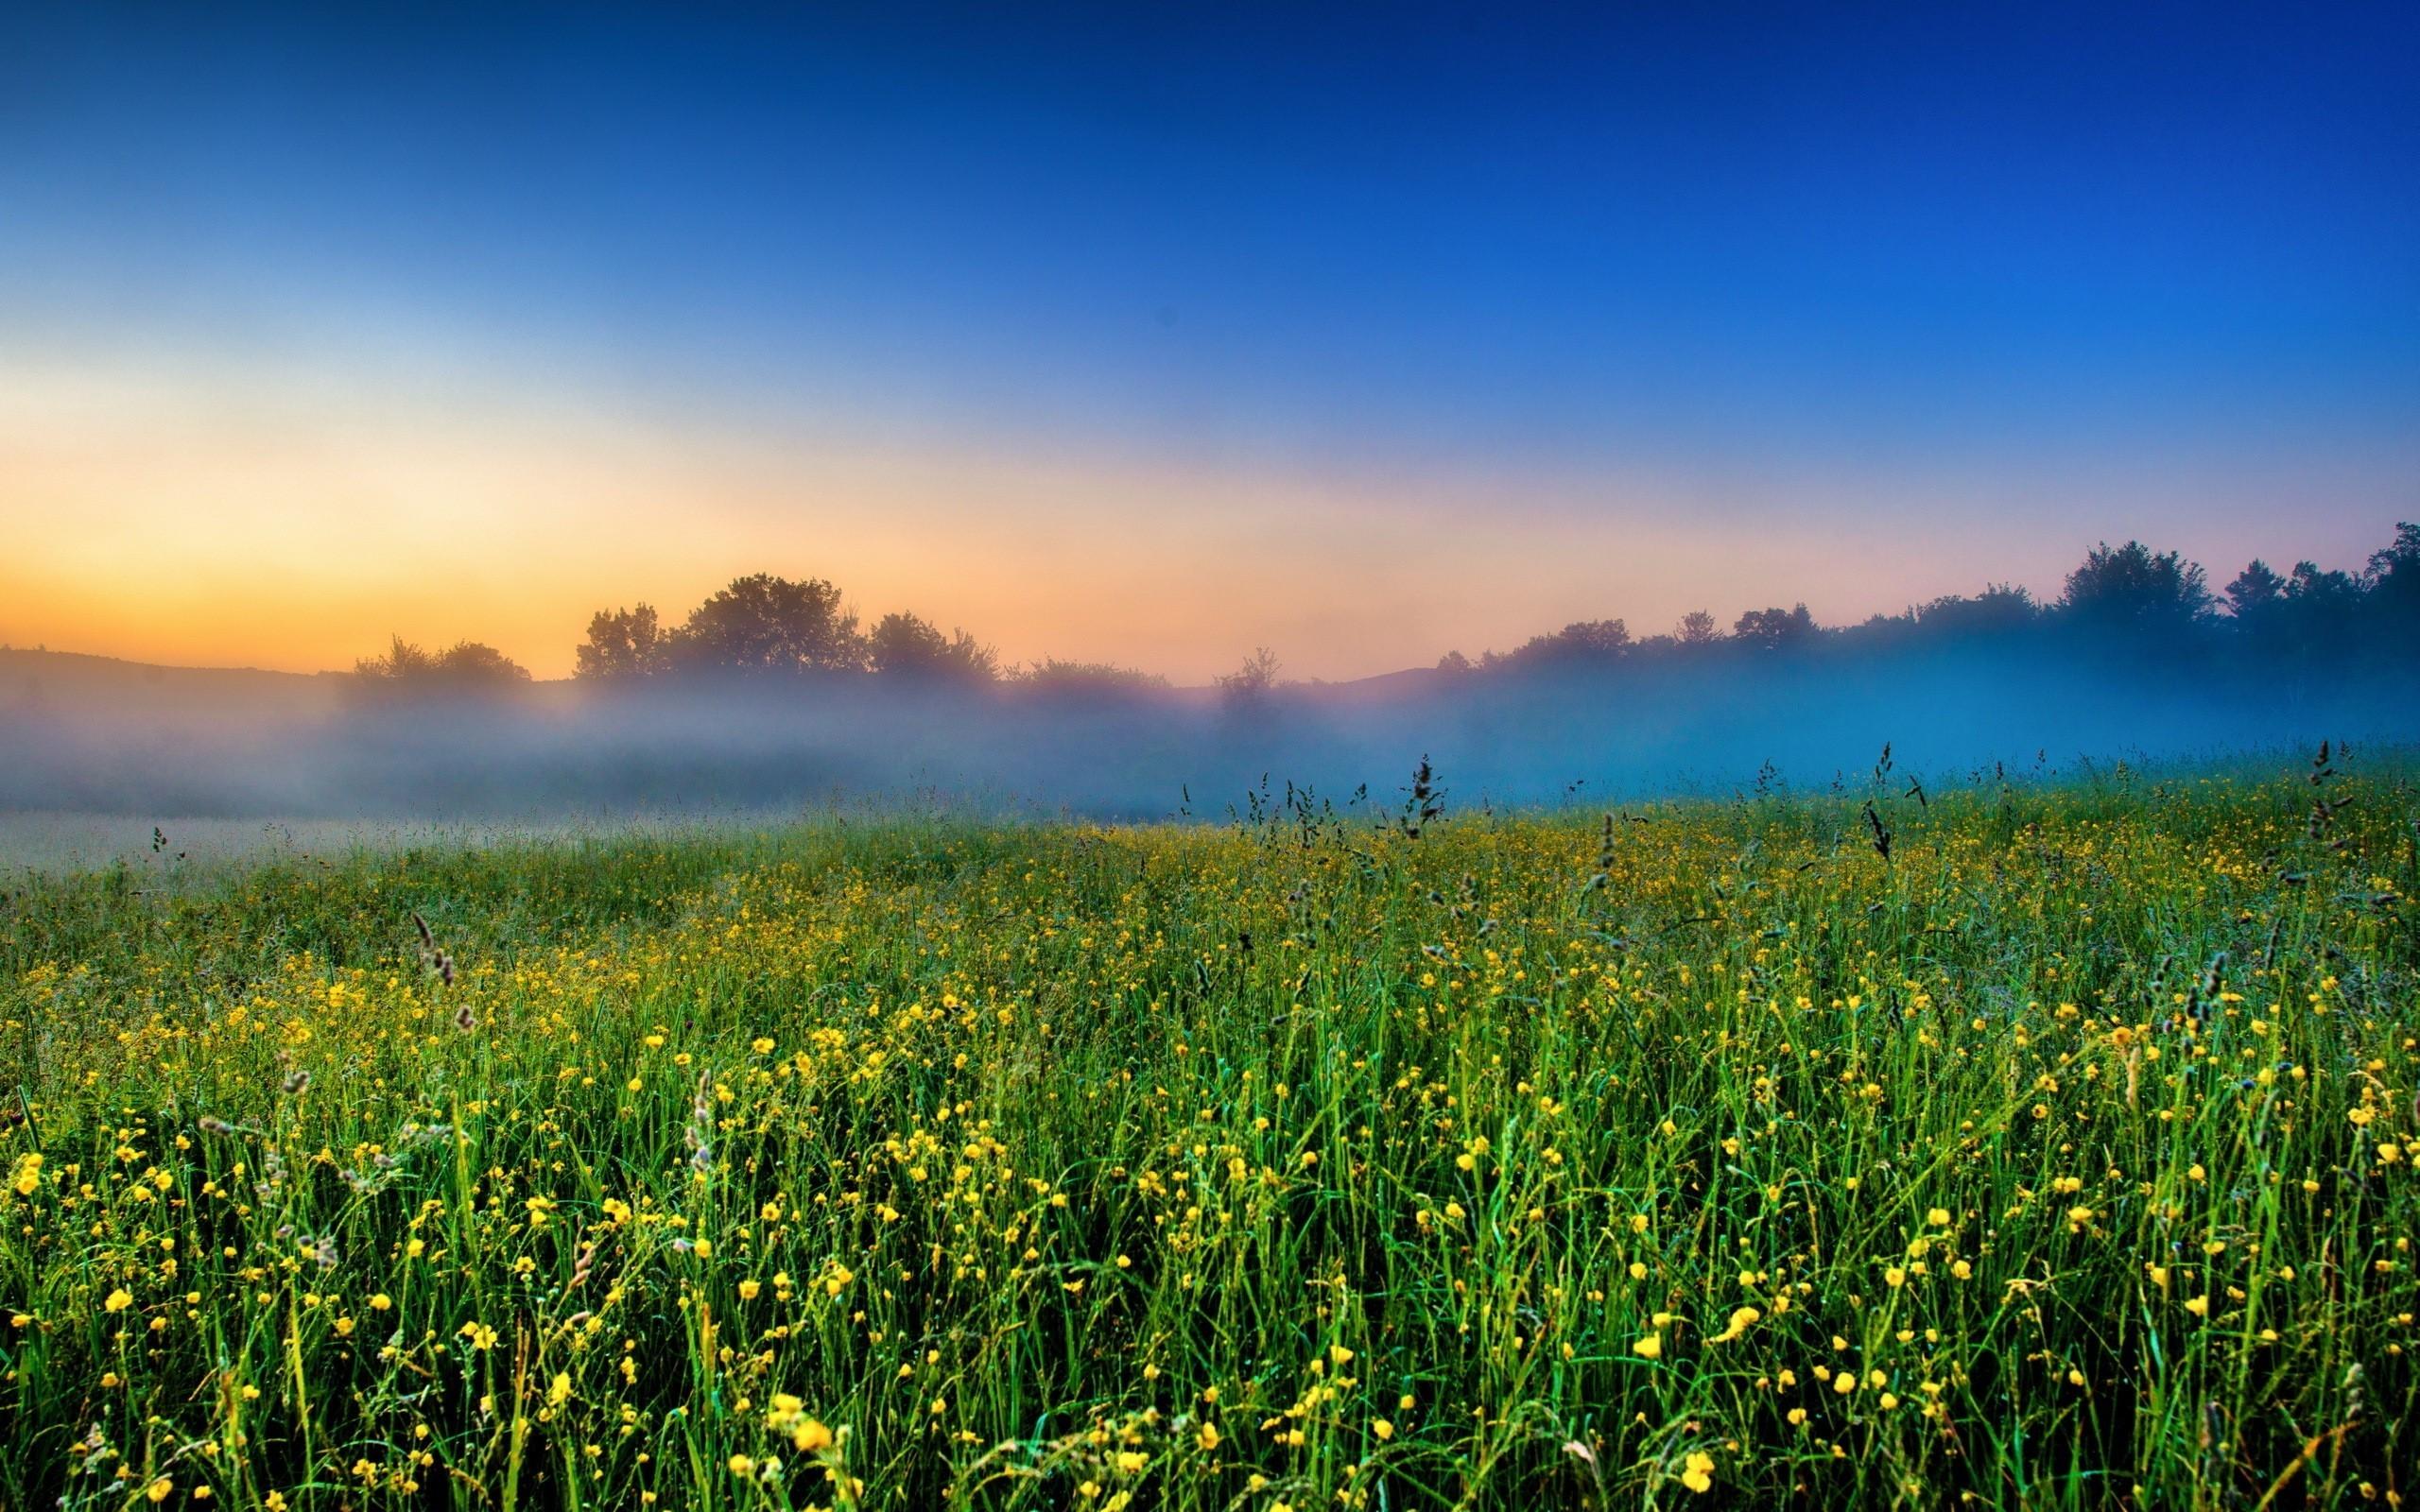 Foggy Field Farm Nice Nature Wallpaper